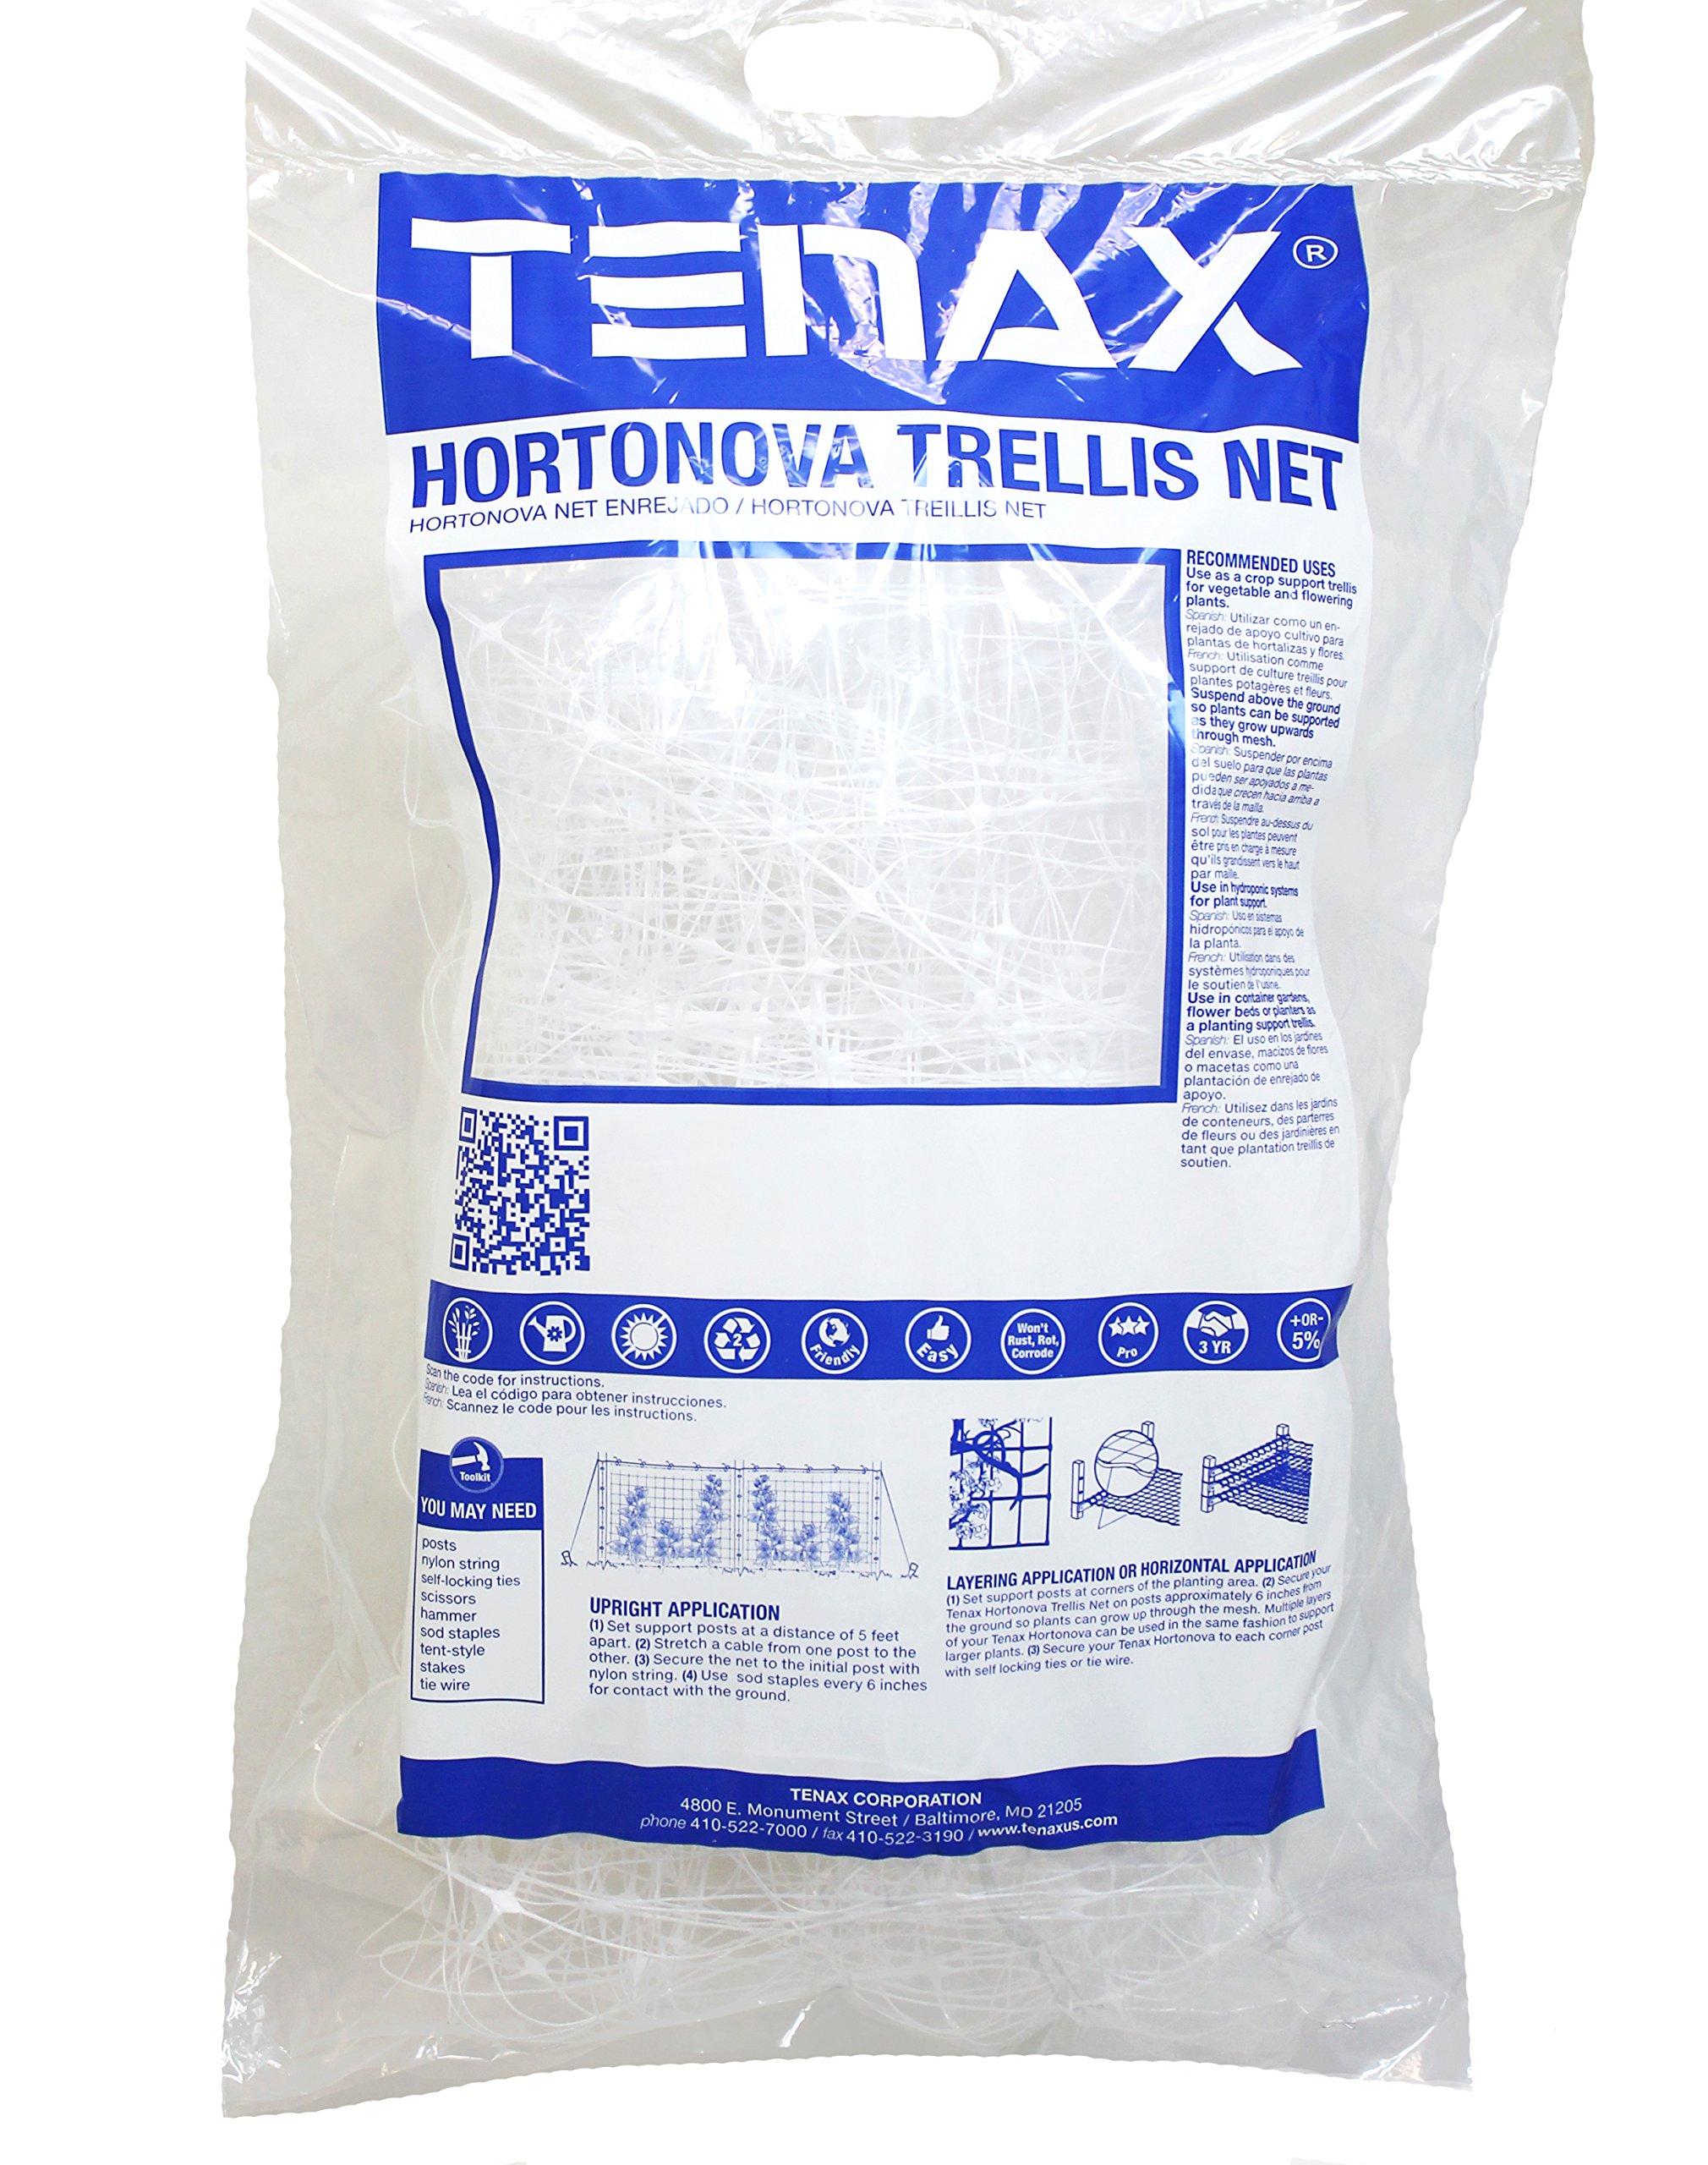 Tenax 2A150061 Hortonova Plant Trellis Net Lm, 59'' x 100', White